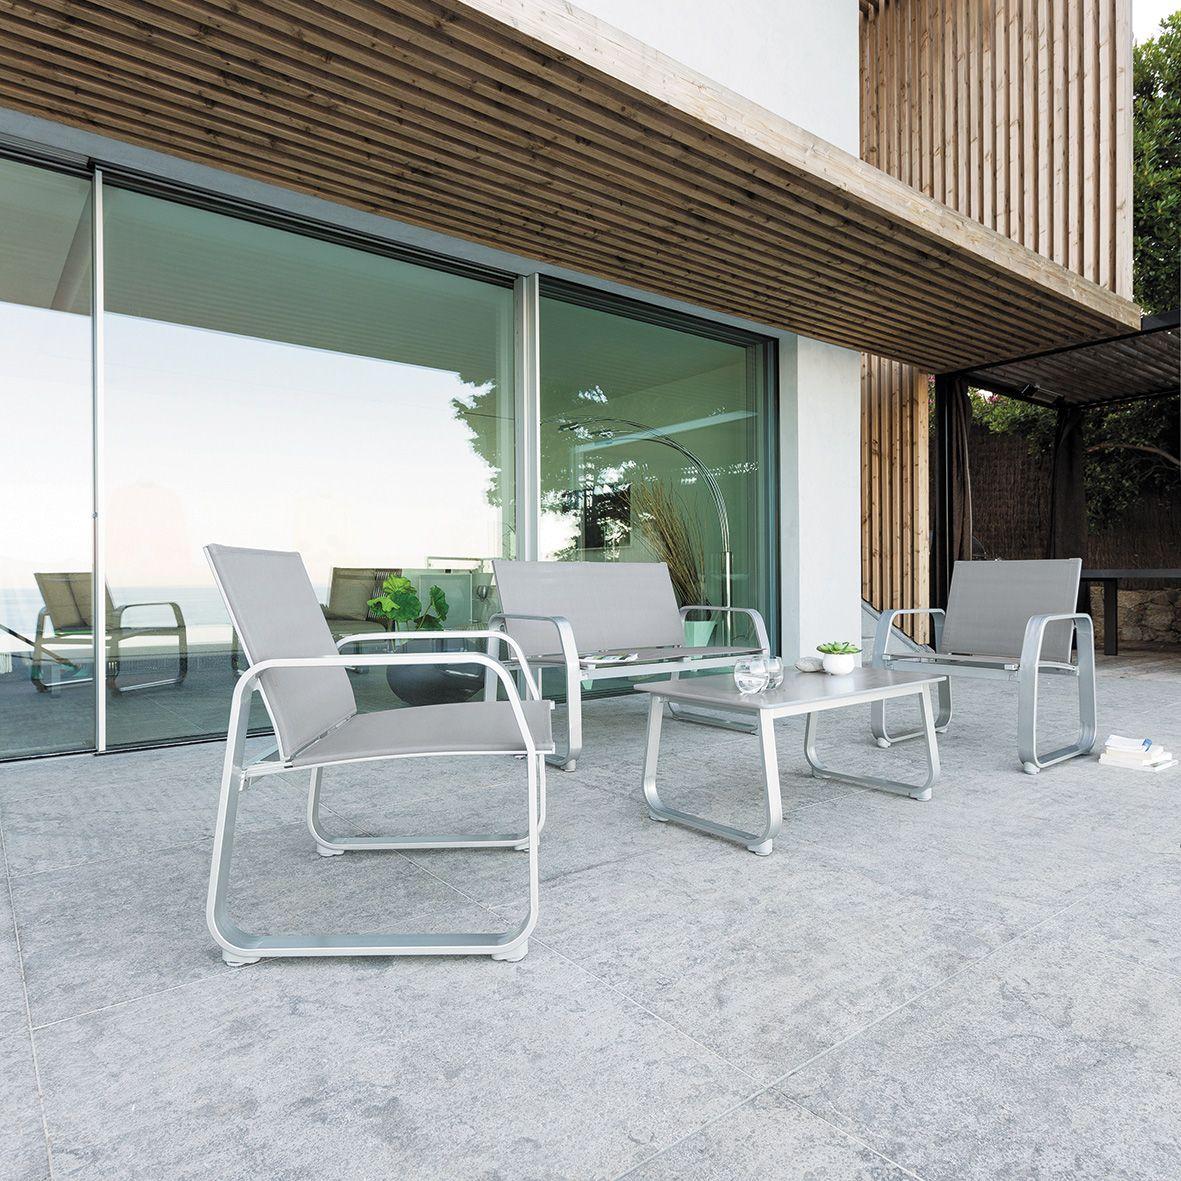 Epingle Sur Terrasse Moderne